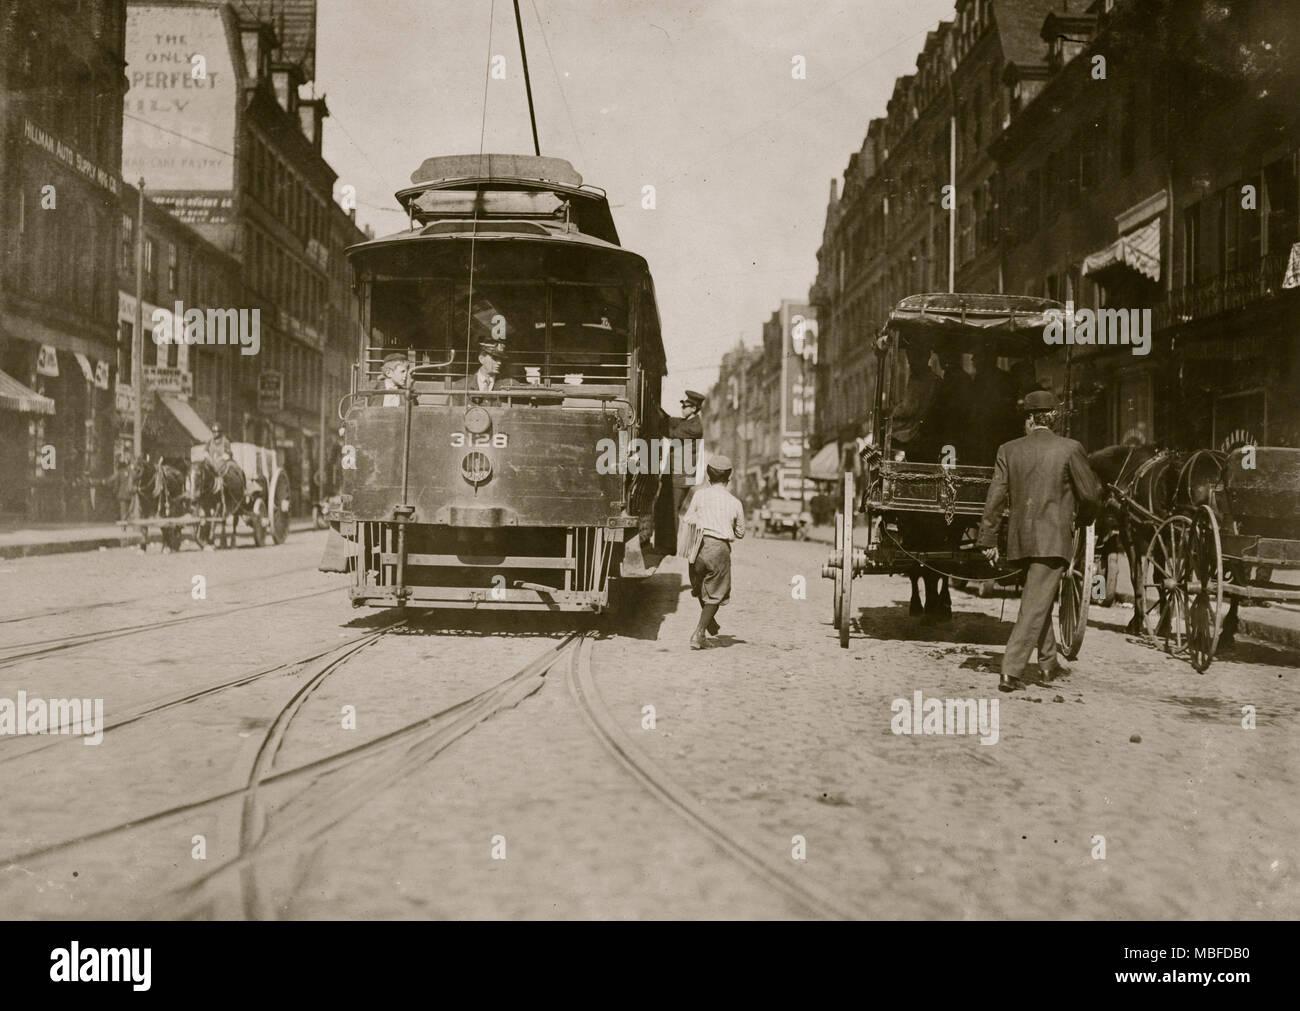 Trolleys & Cars - Stock Image